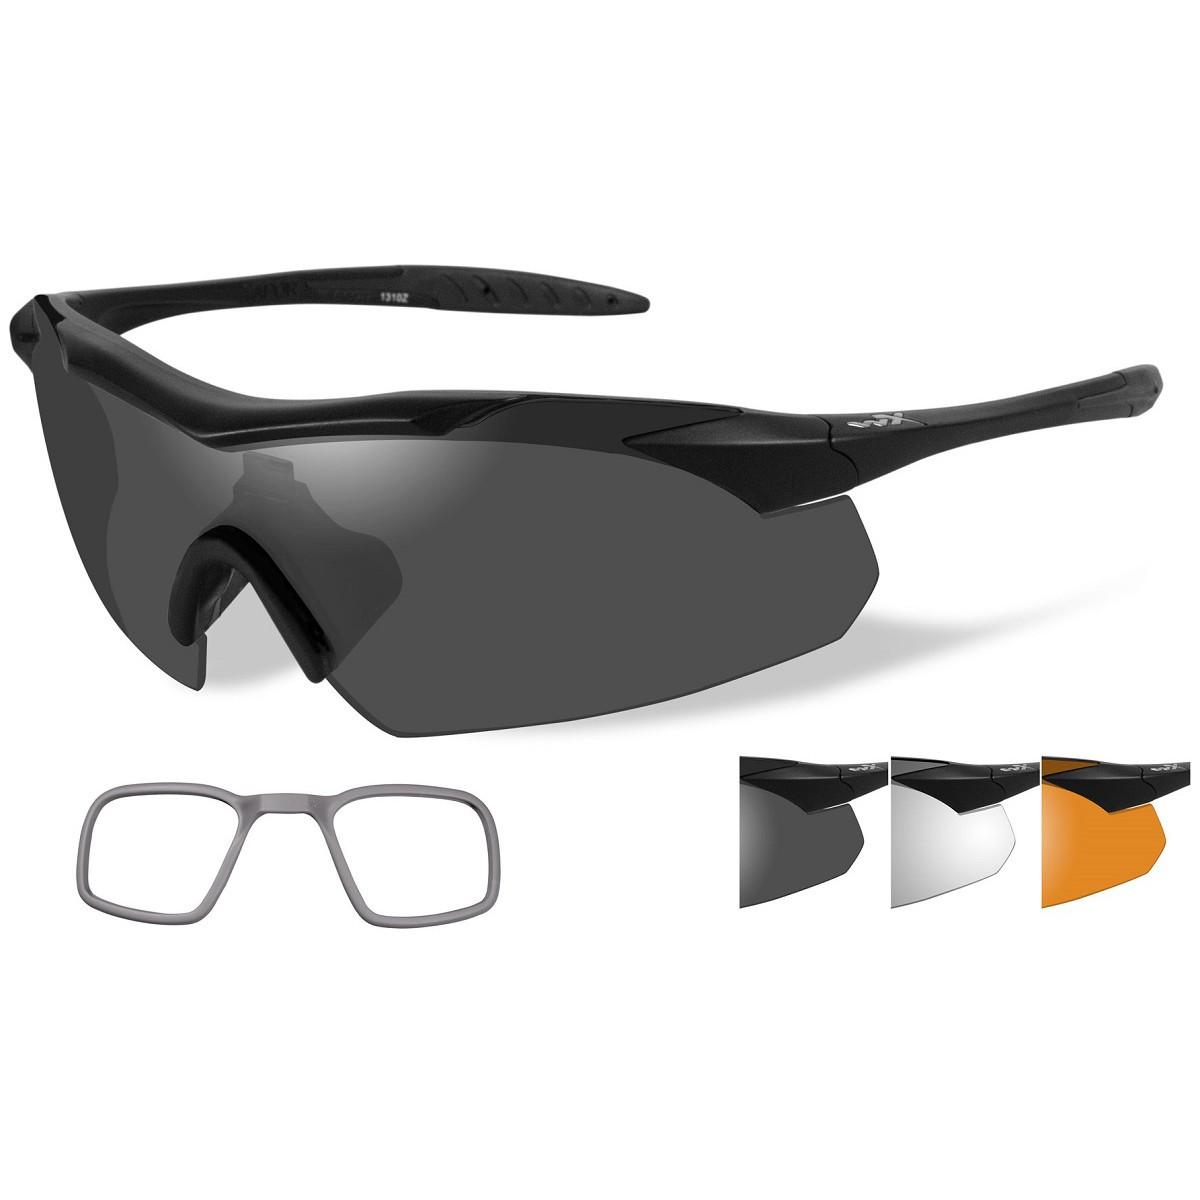 04c47139d0 Wiley X 3502RX WX Vapor Safety Glasses w  RX Inserts - Matte Black Frame -